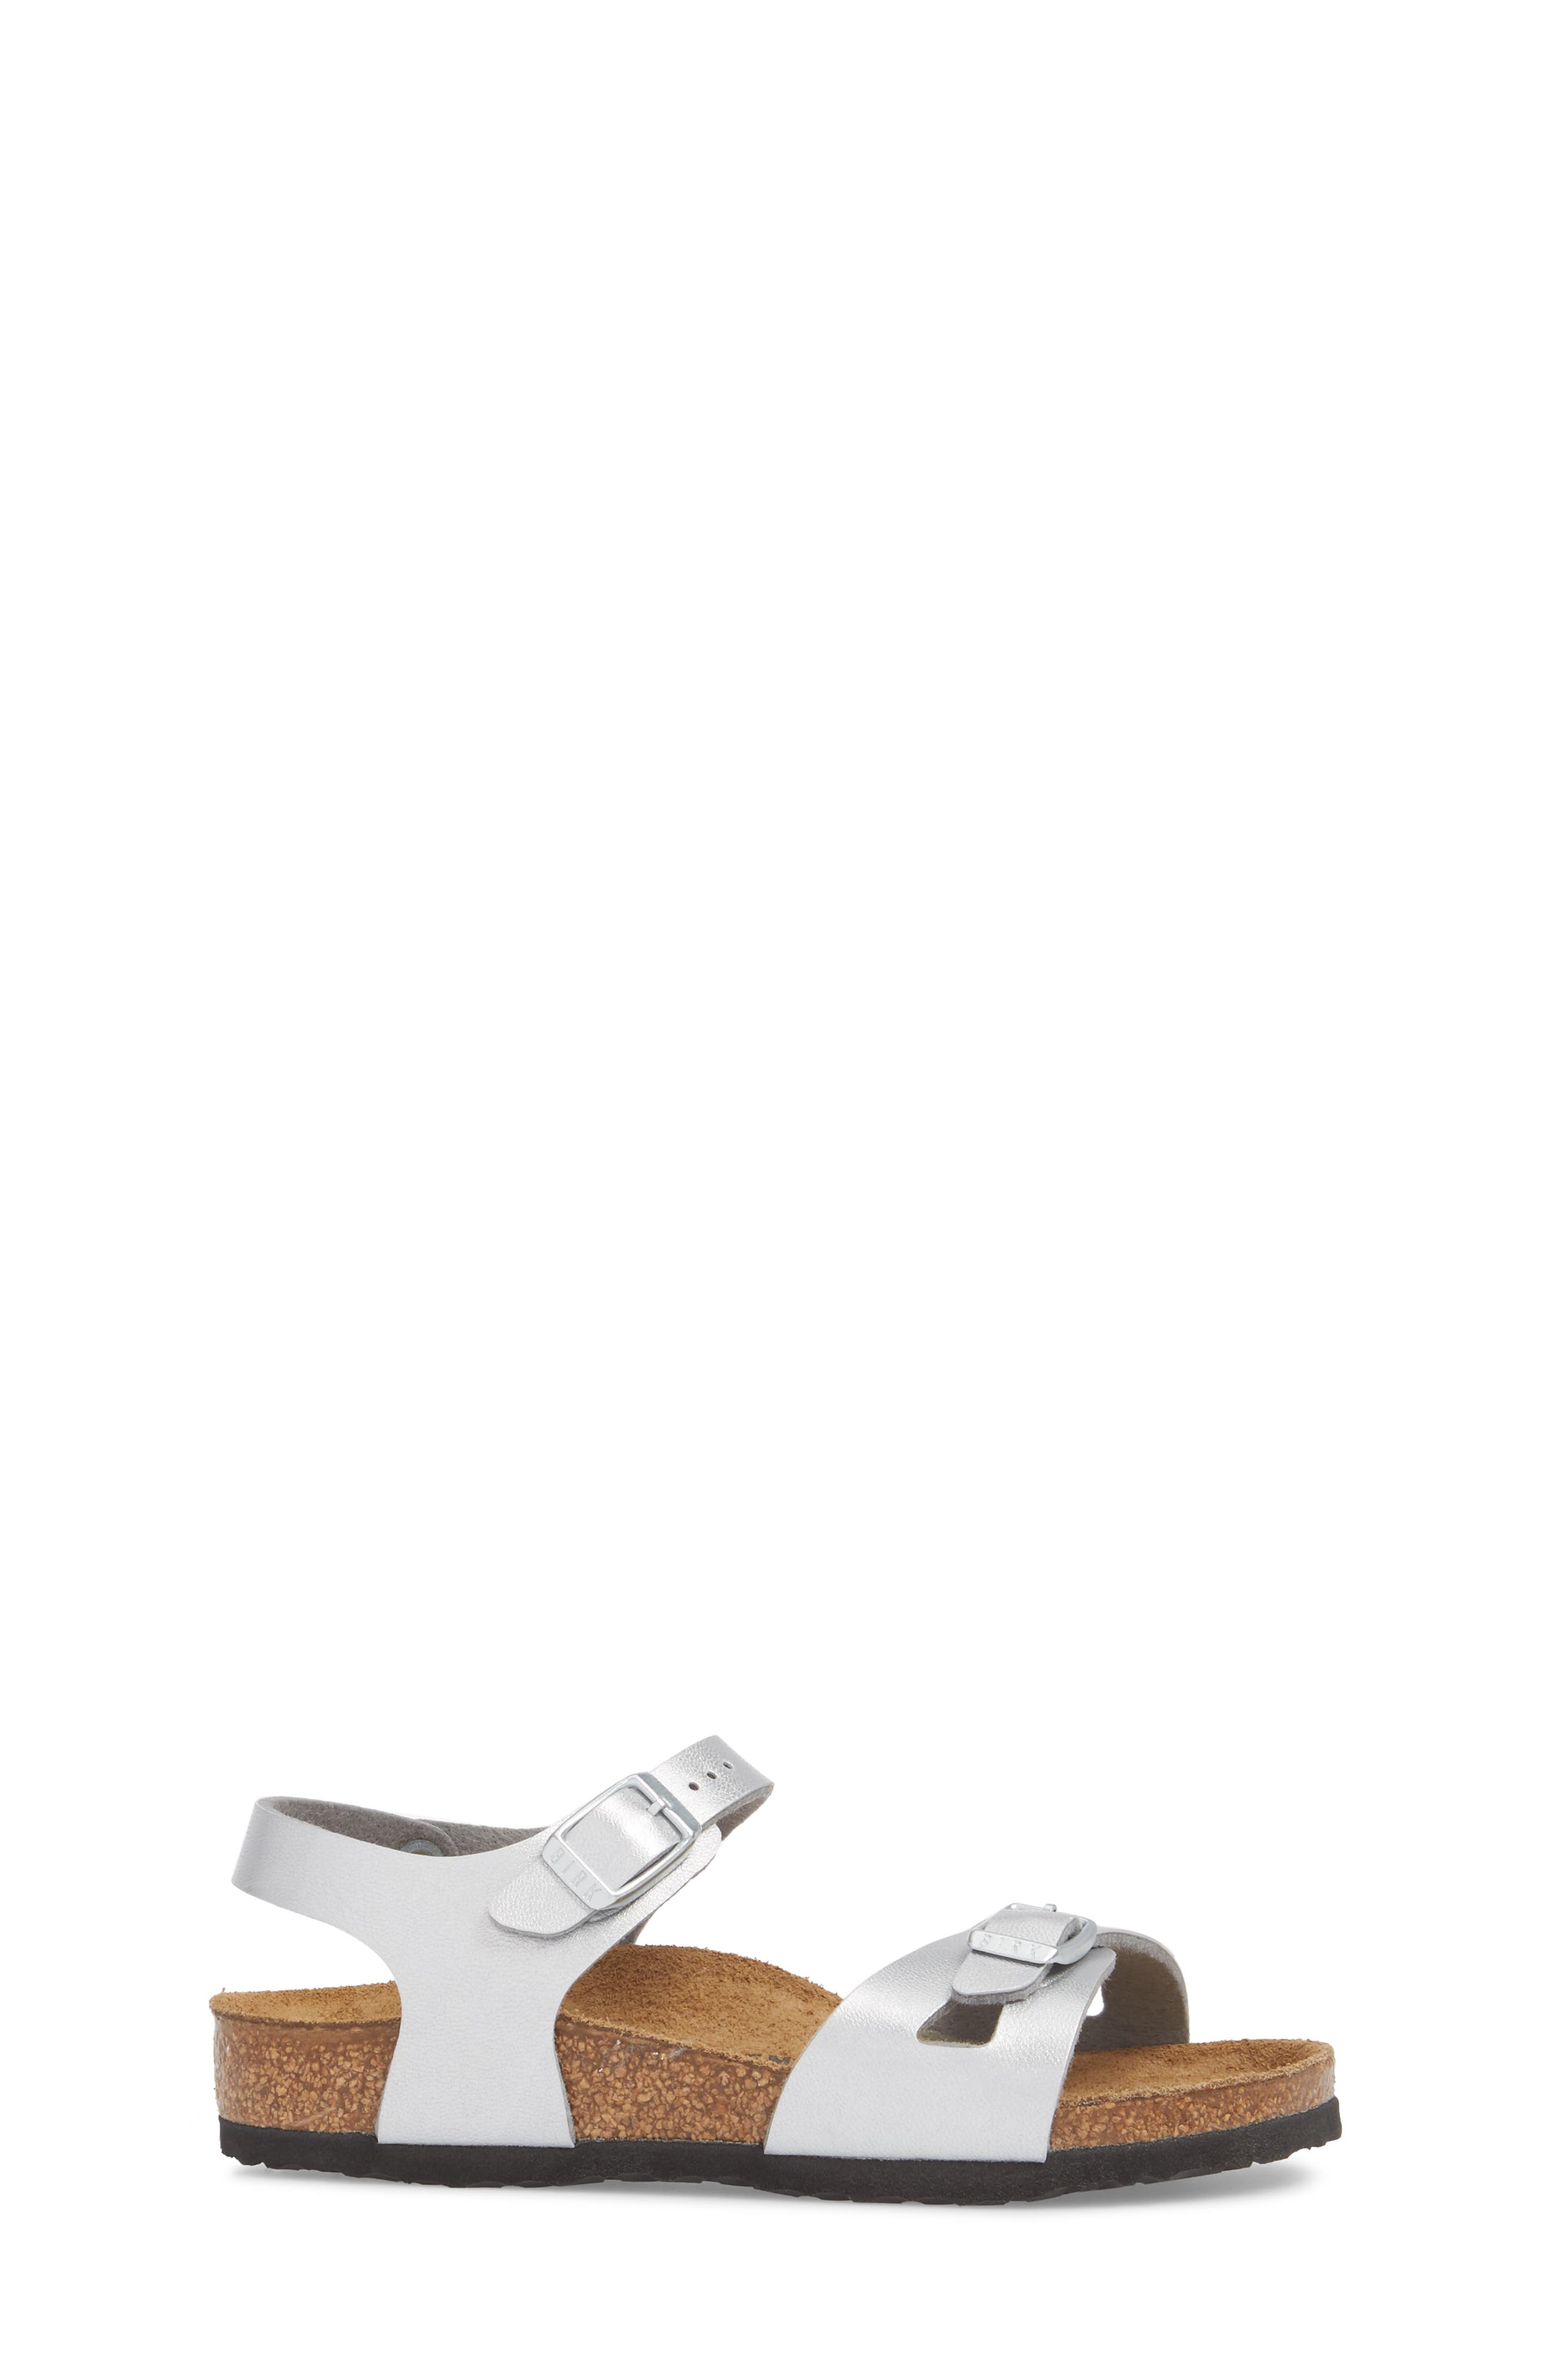 Rio Metallic Sandal,                             Alternate thumbnail 3, color,                             SILVER